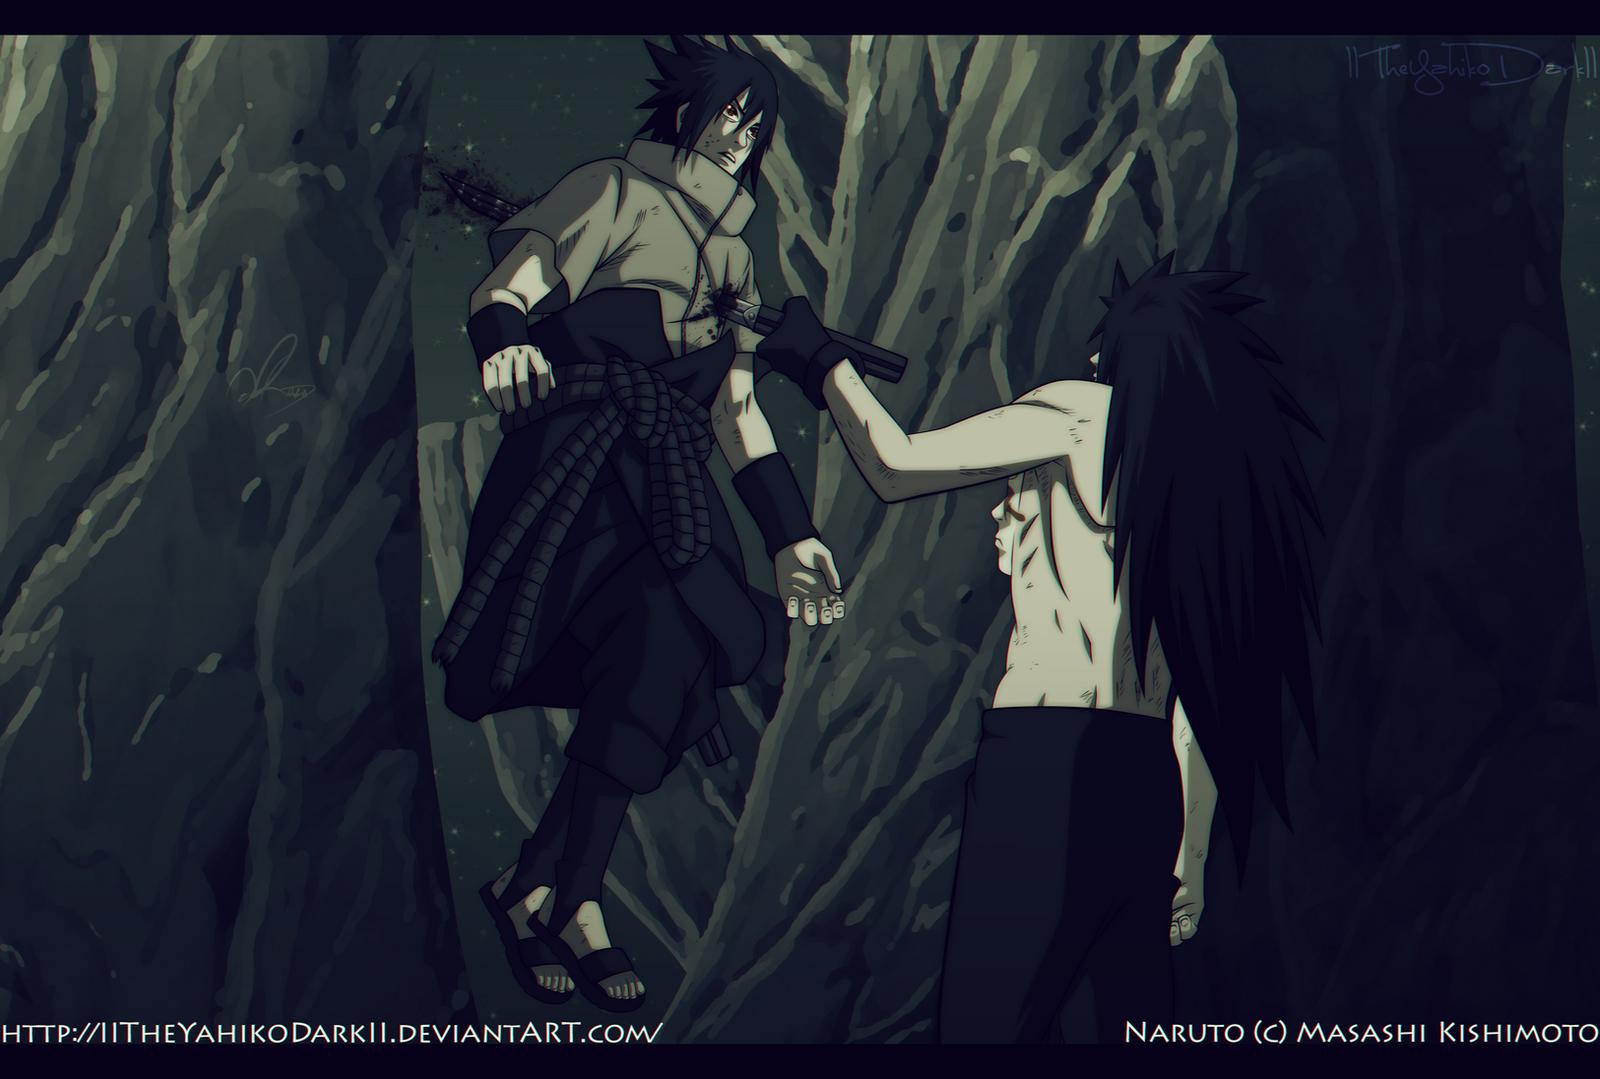 Naruto 661 You Will Die In The Dark by IITheYahikoDarkII